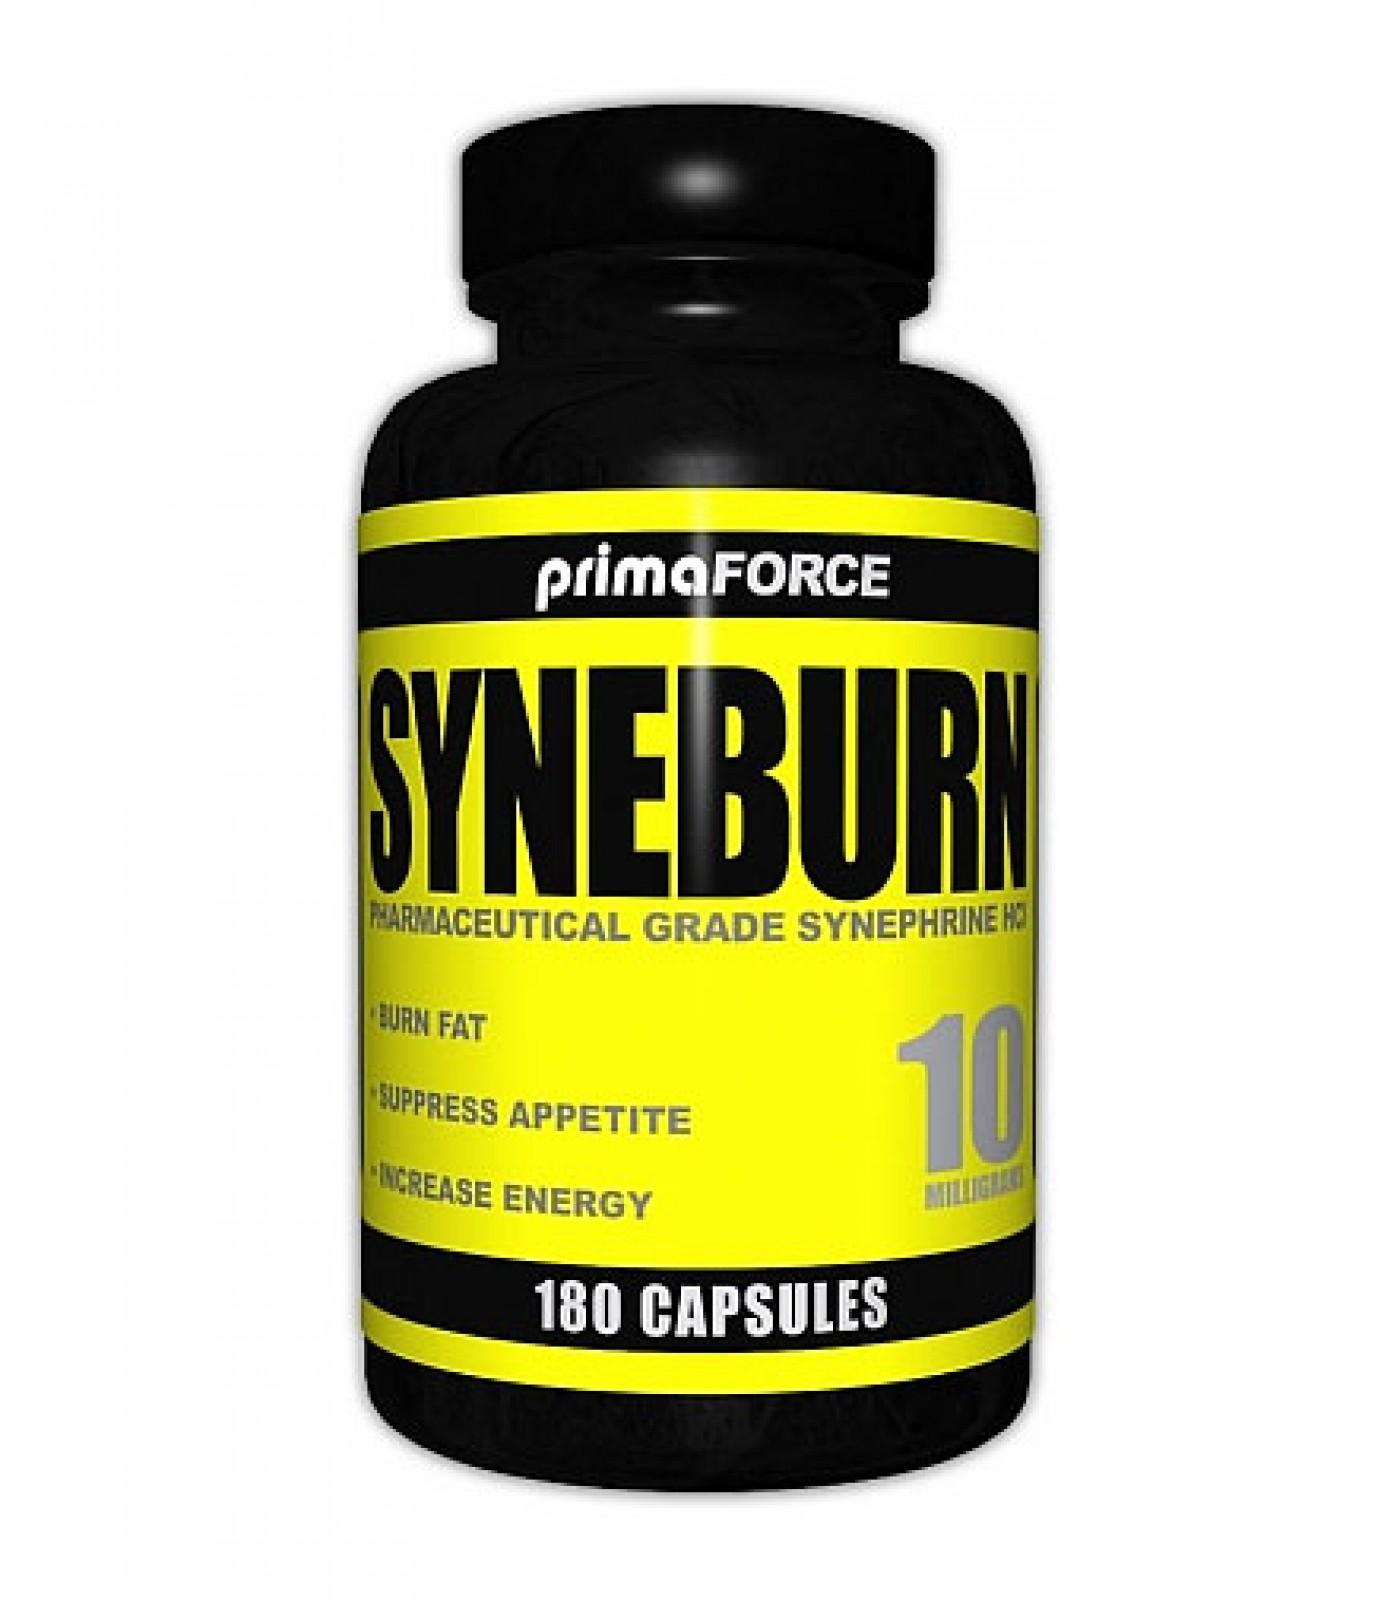 Primaforce - Syneburn / 180 caps